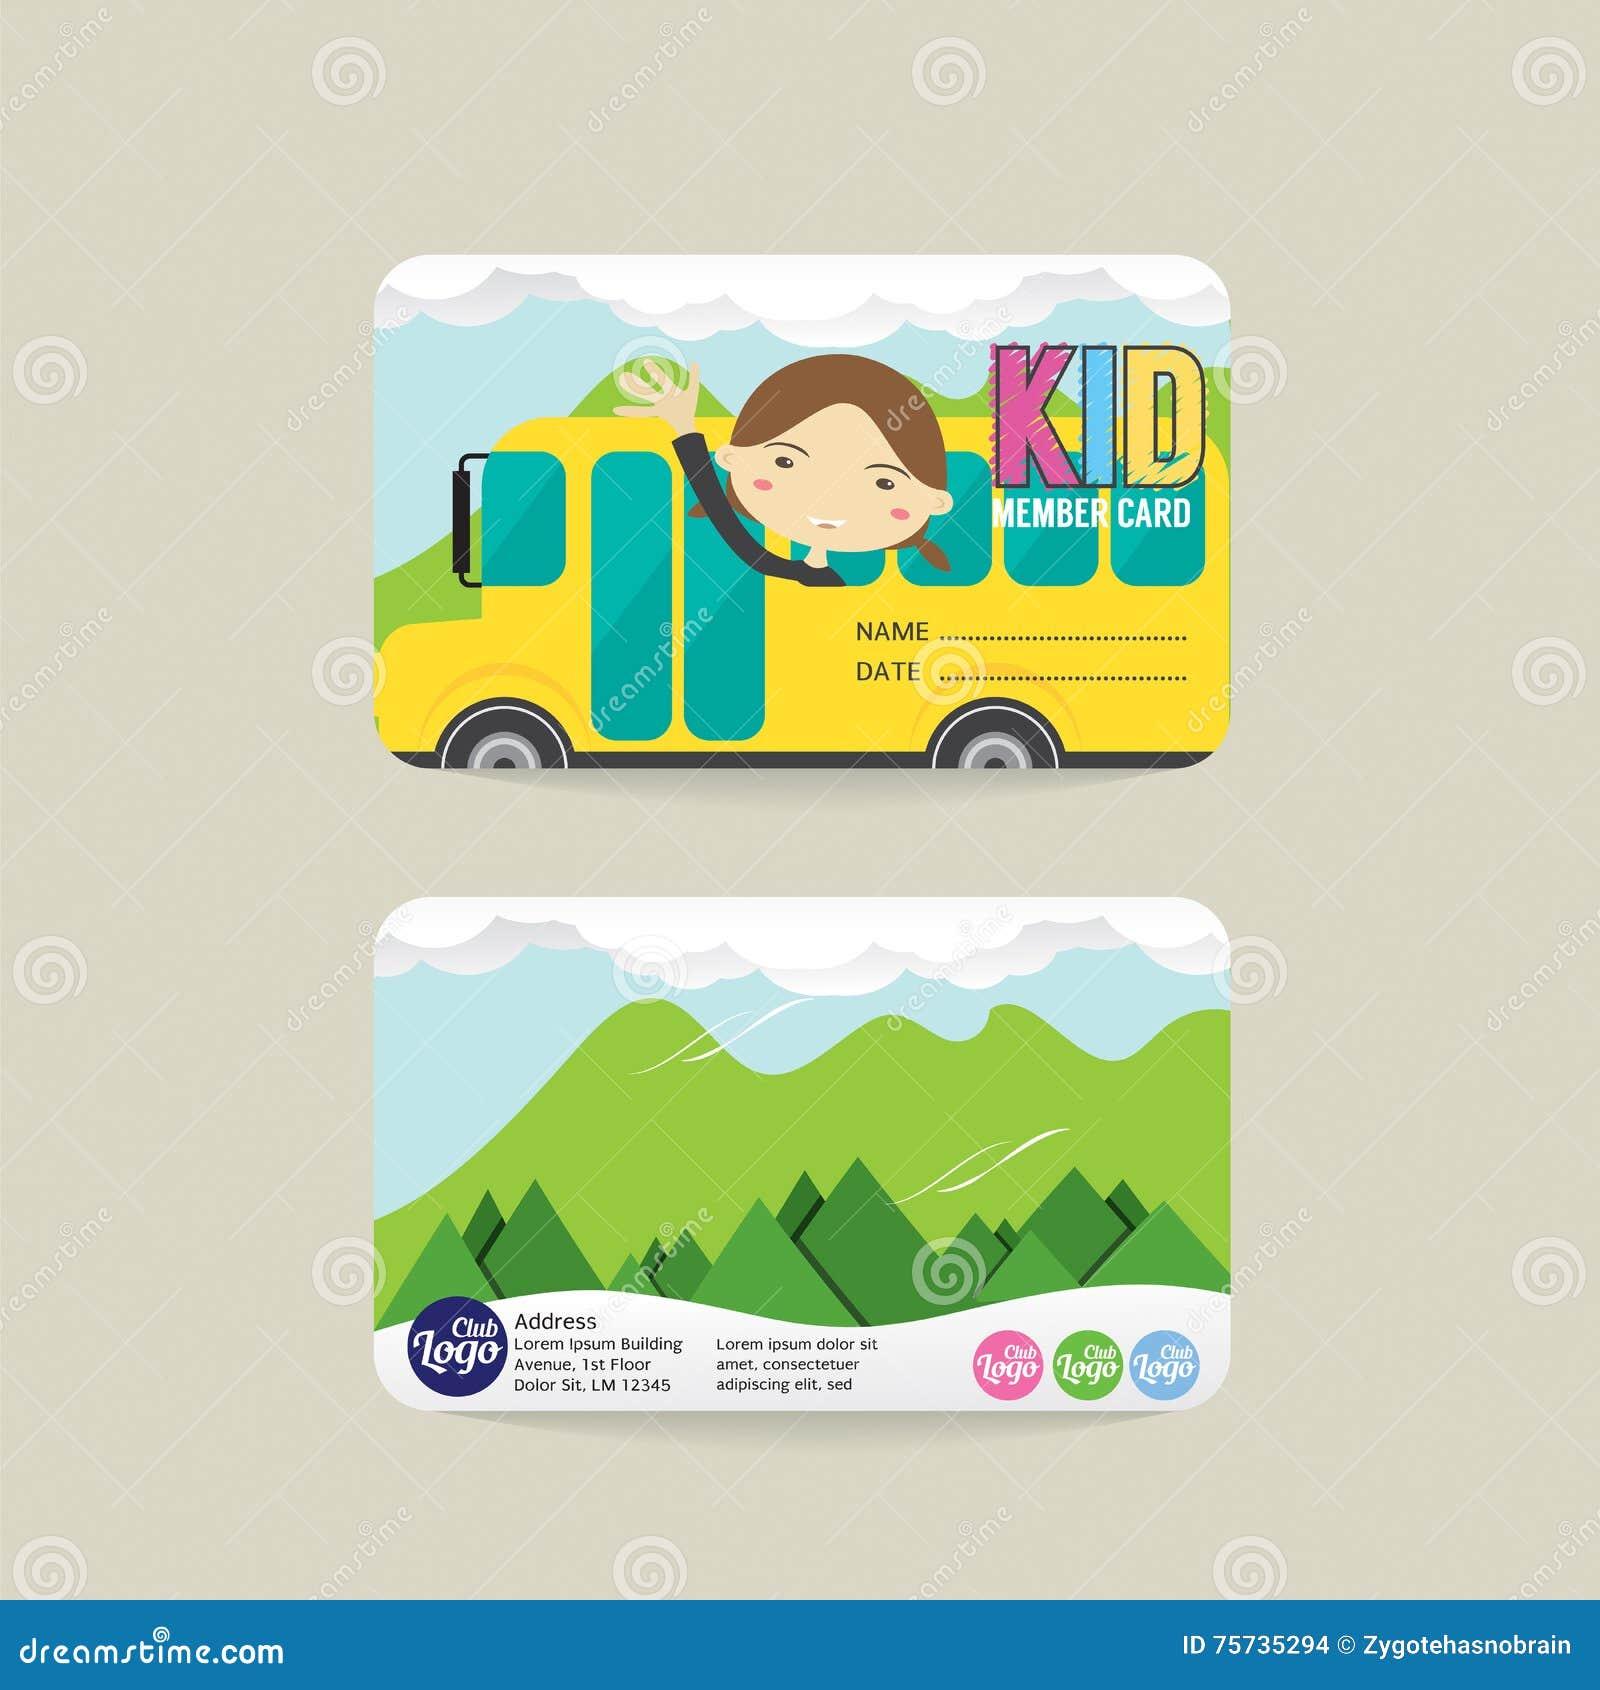 Front And Back Kids Member Card Template Vector Image – Membership Card Design